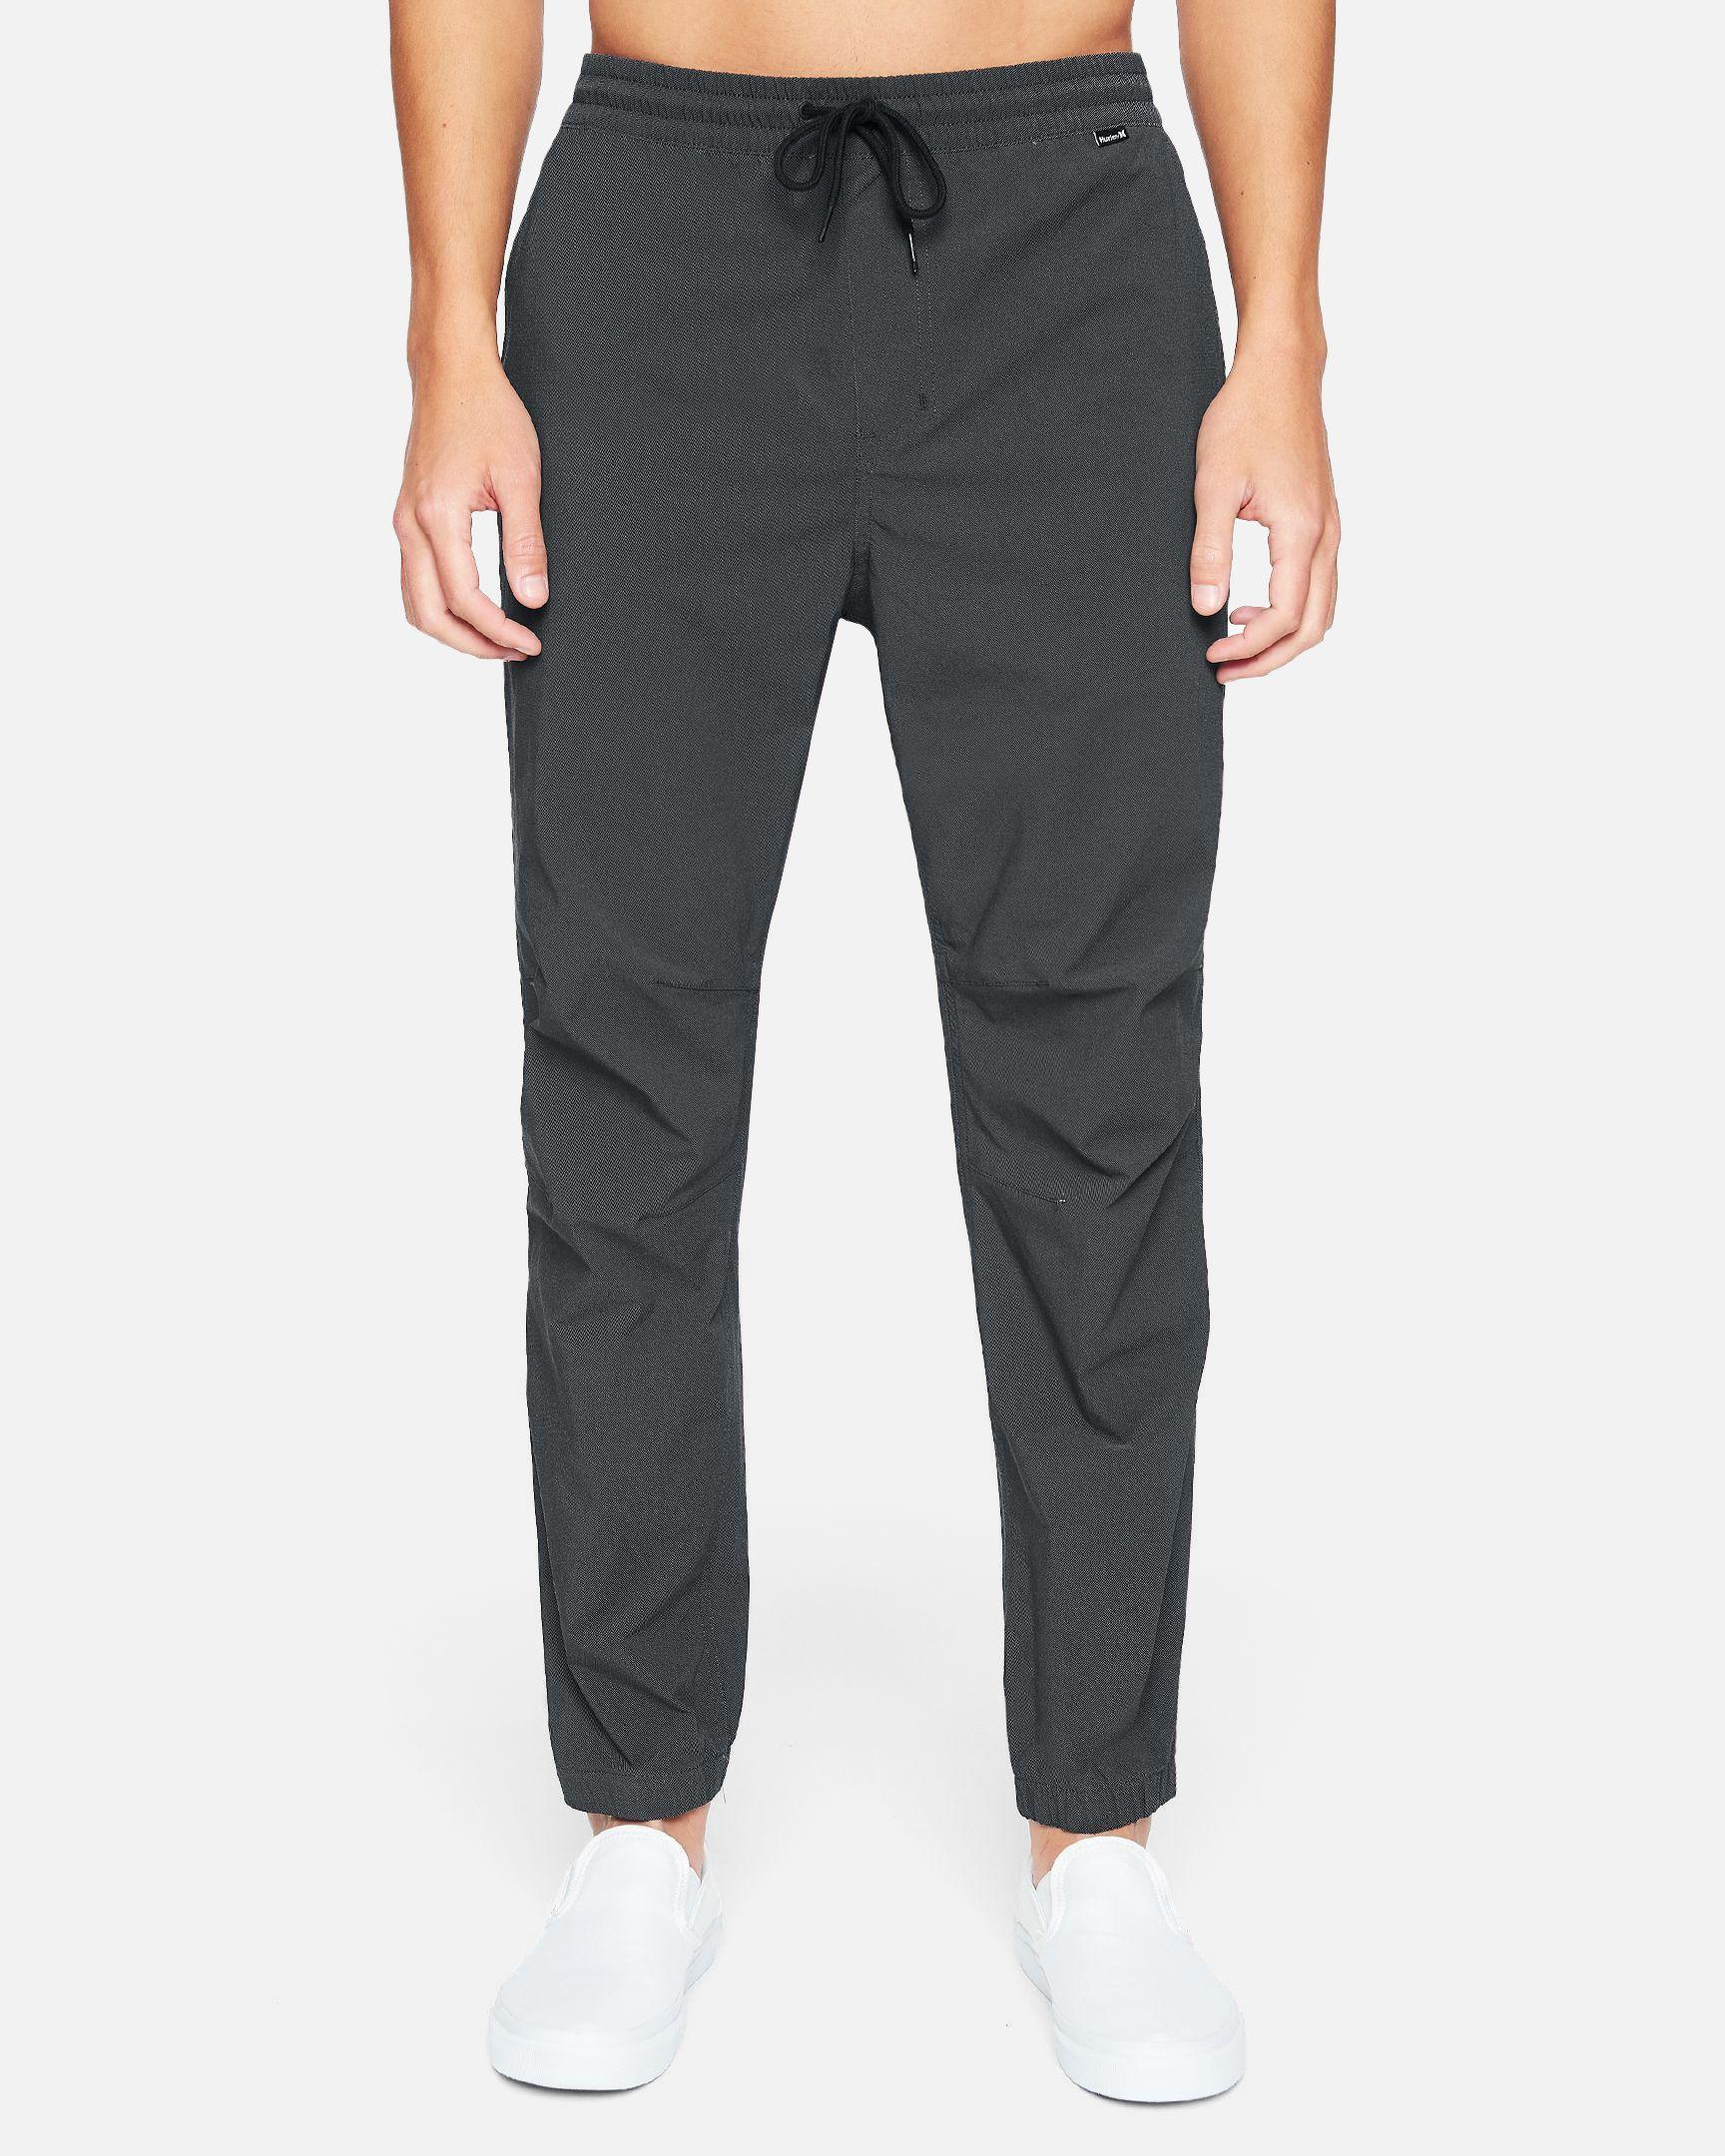 Men's Dri-Fit Jogger in Black, Size Medium